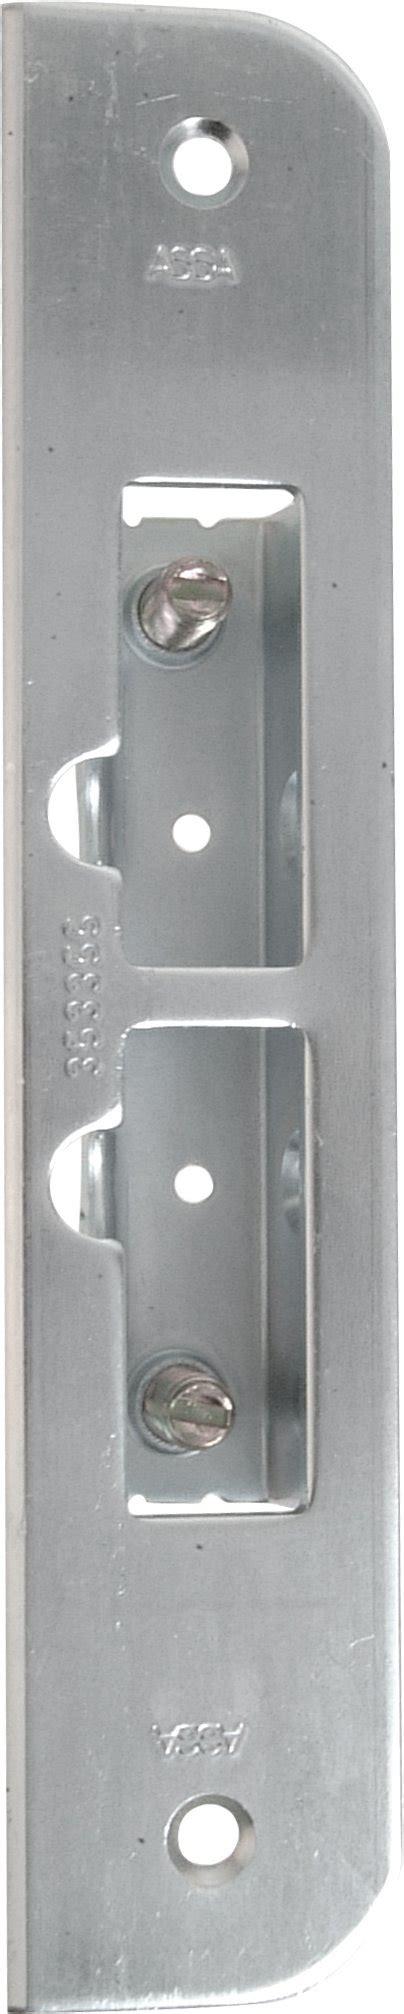 flat security striking plates assa abloy oem locks window locks industrial locks